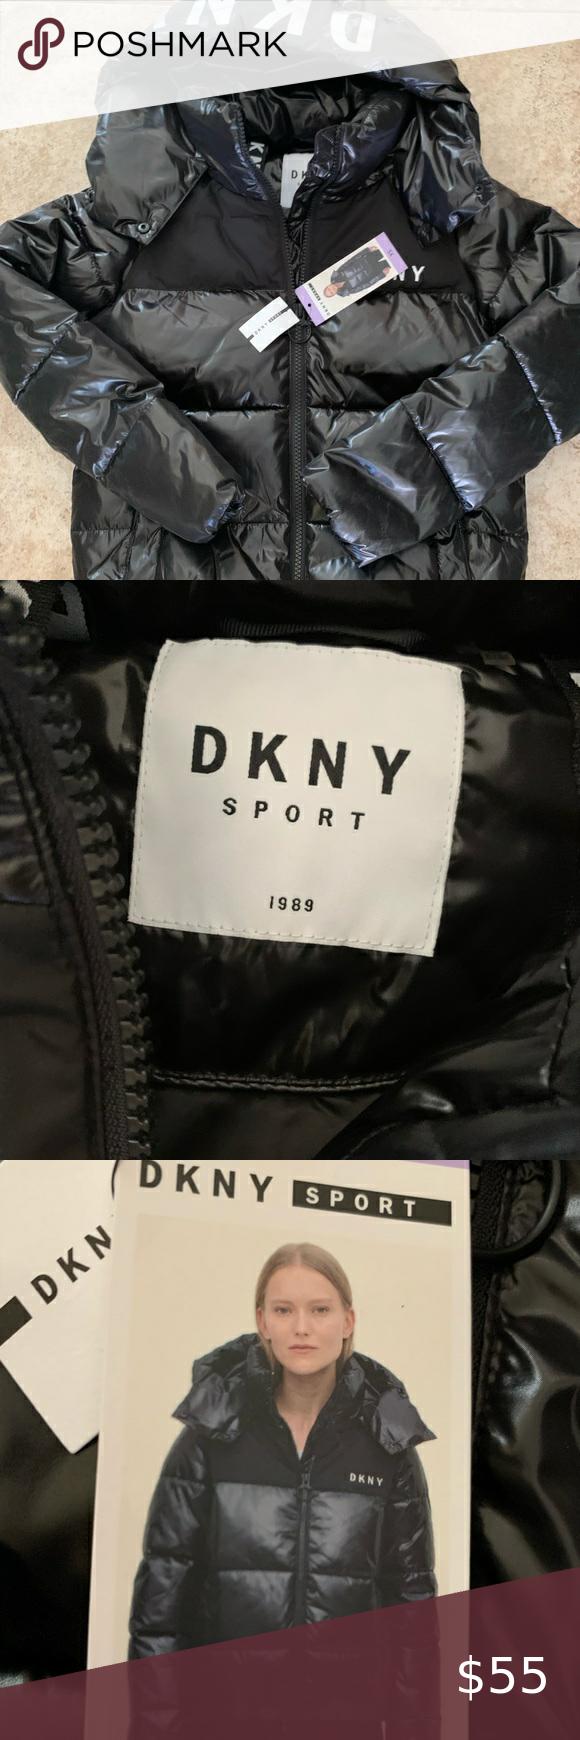 Dkny Women S Jacket New New Puffer Dkny Sport New With Tags Size Xs Dkny Jackets Coats Puffers Dkny Jackets Jackets For Women [ 1740 x 580 Pixel ]